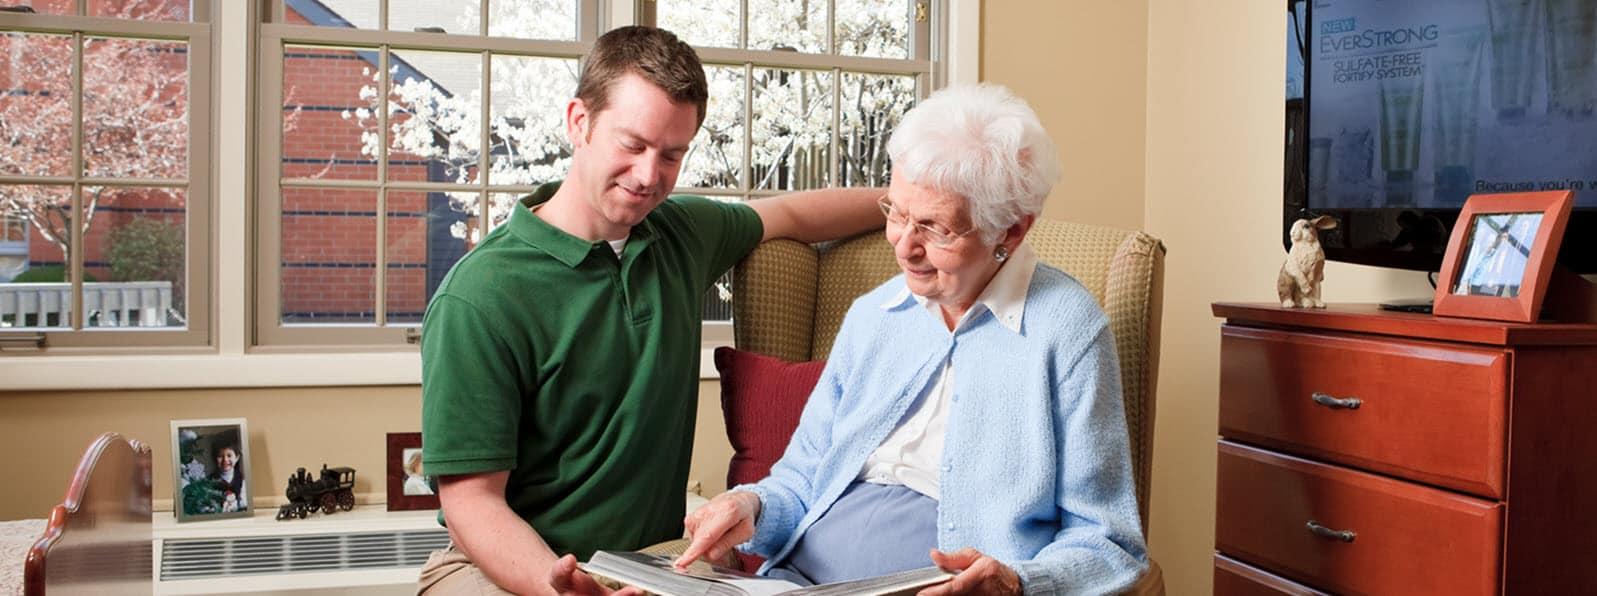 Erie skilled nursing care